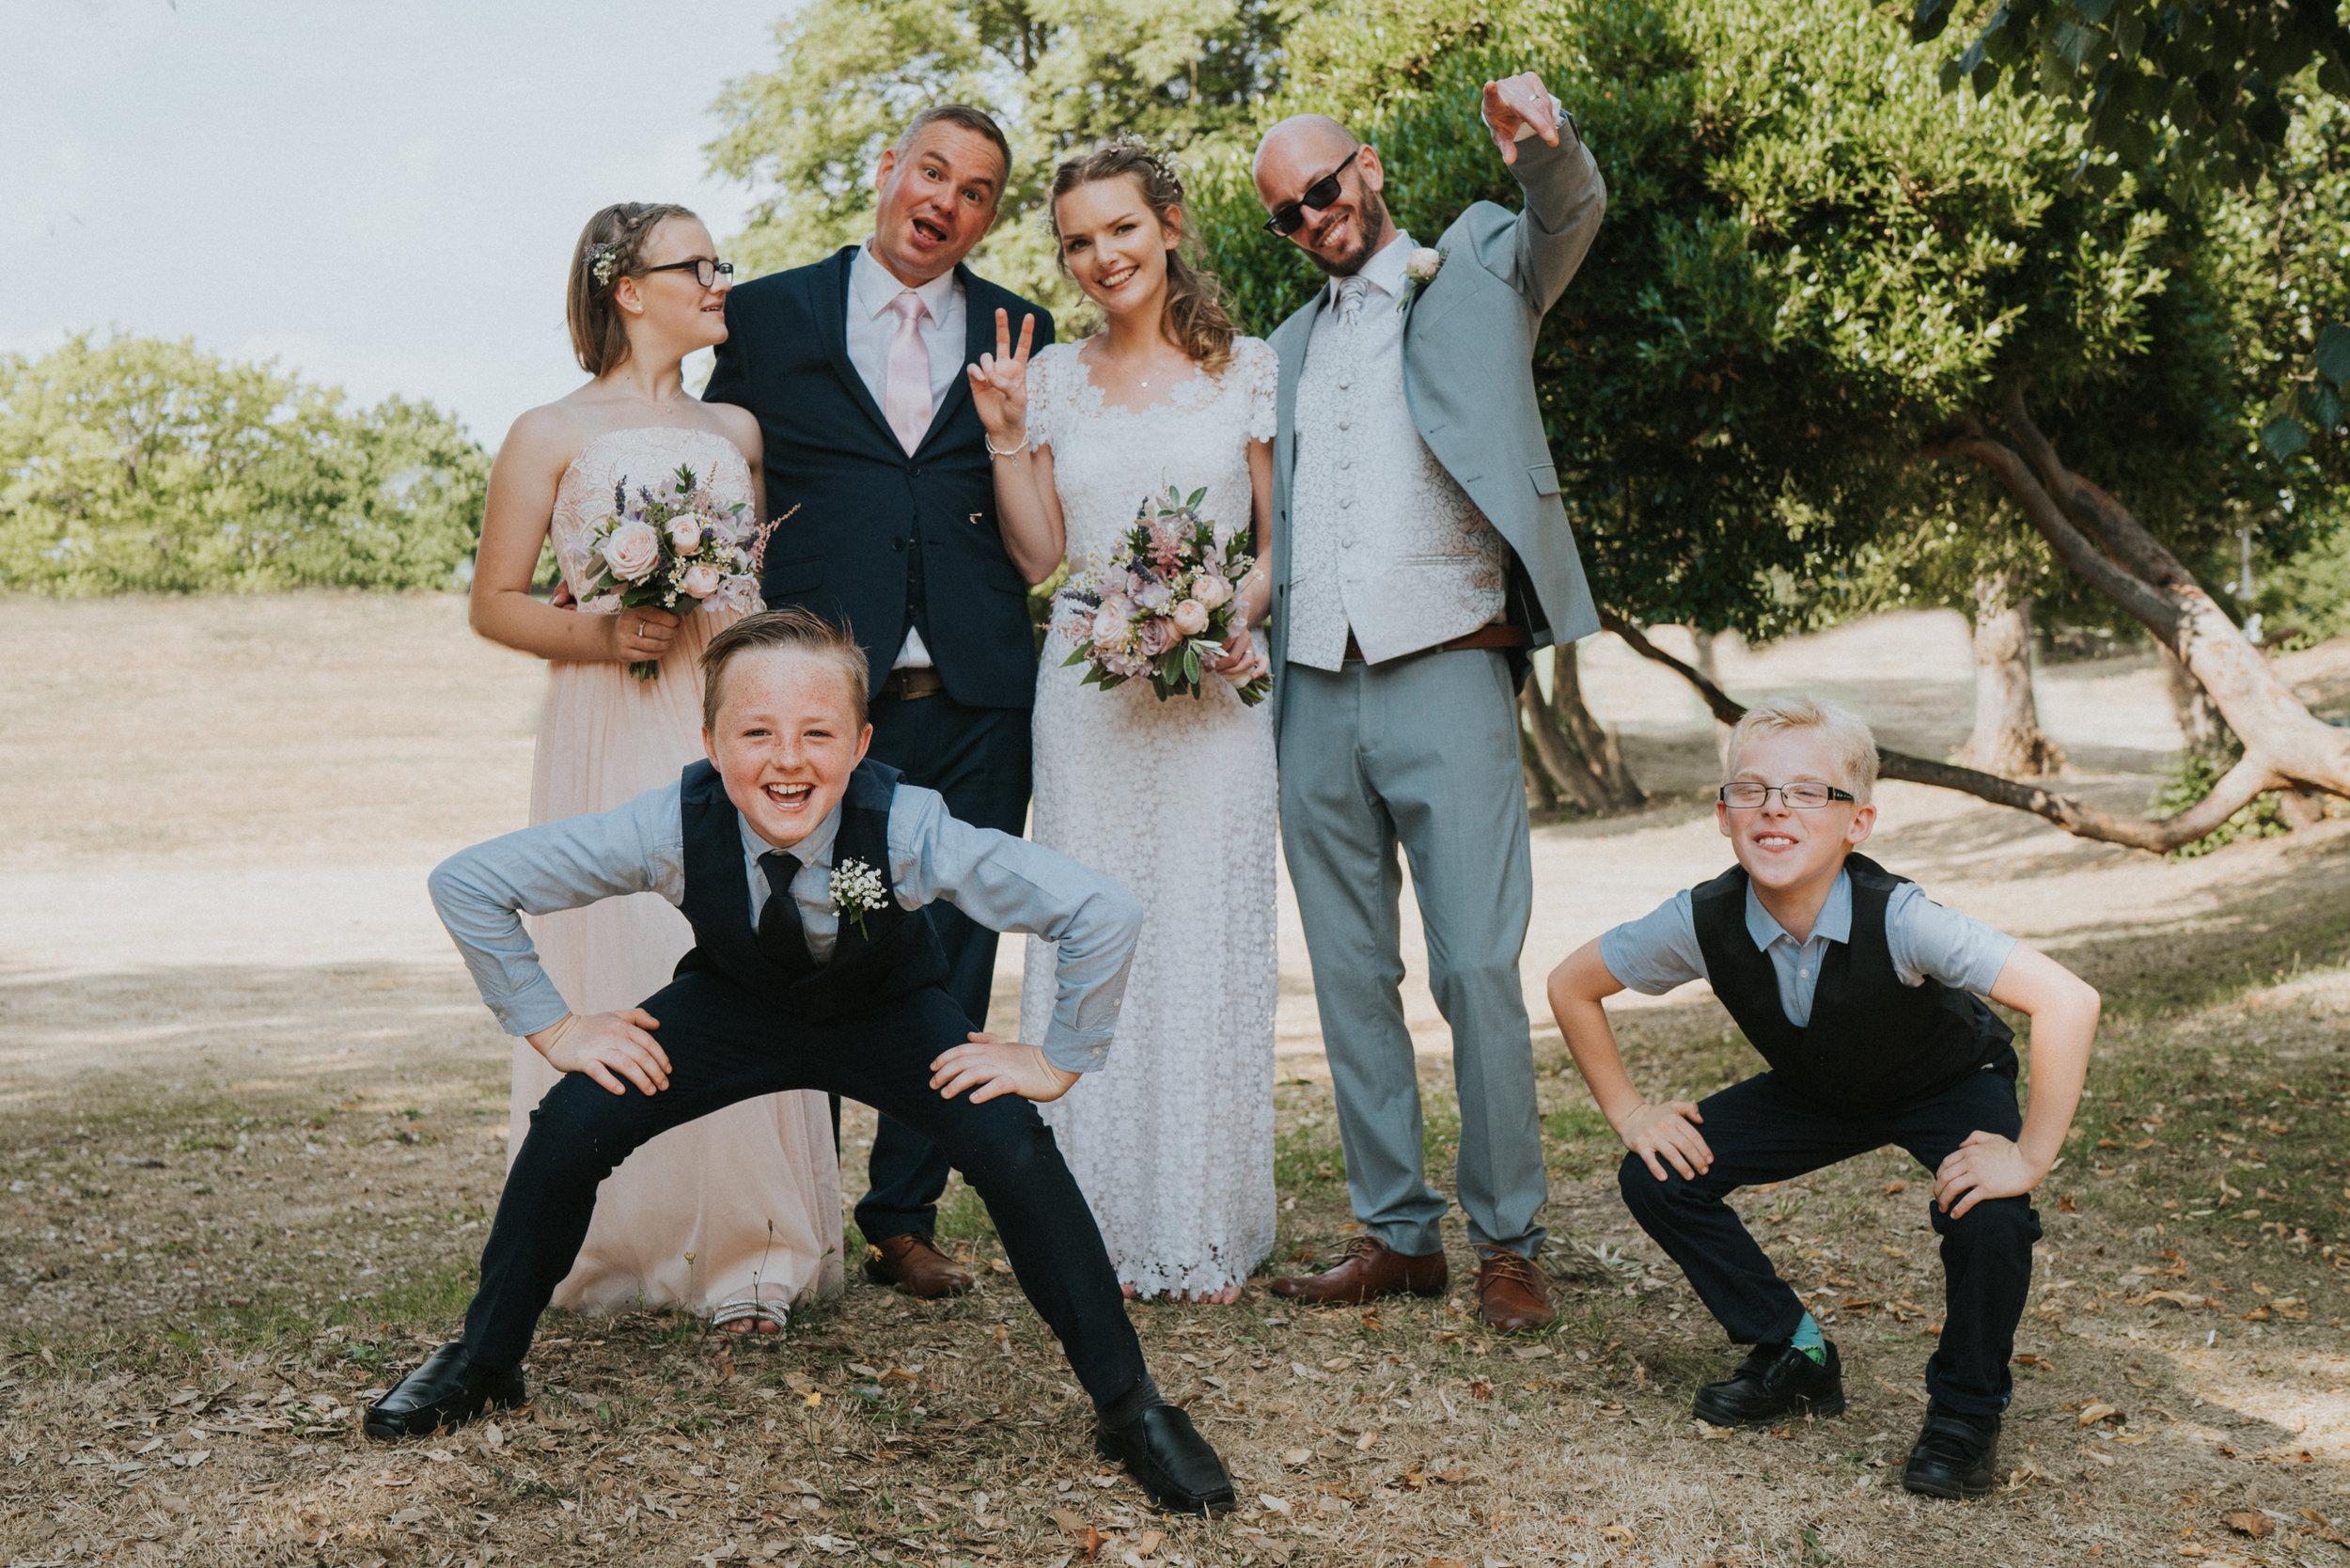 Grace-Elizabeth-Georgie-Amalaketu-Firstsite-Colchester-Essex-Boho-Buddhist-Wedding-Alternative-Wedding-Photography-Essex (76 of 100).jpg